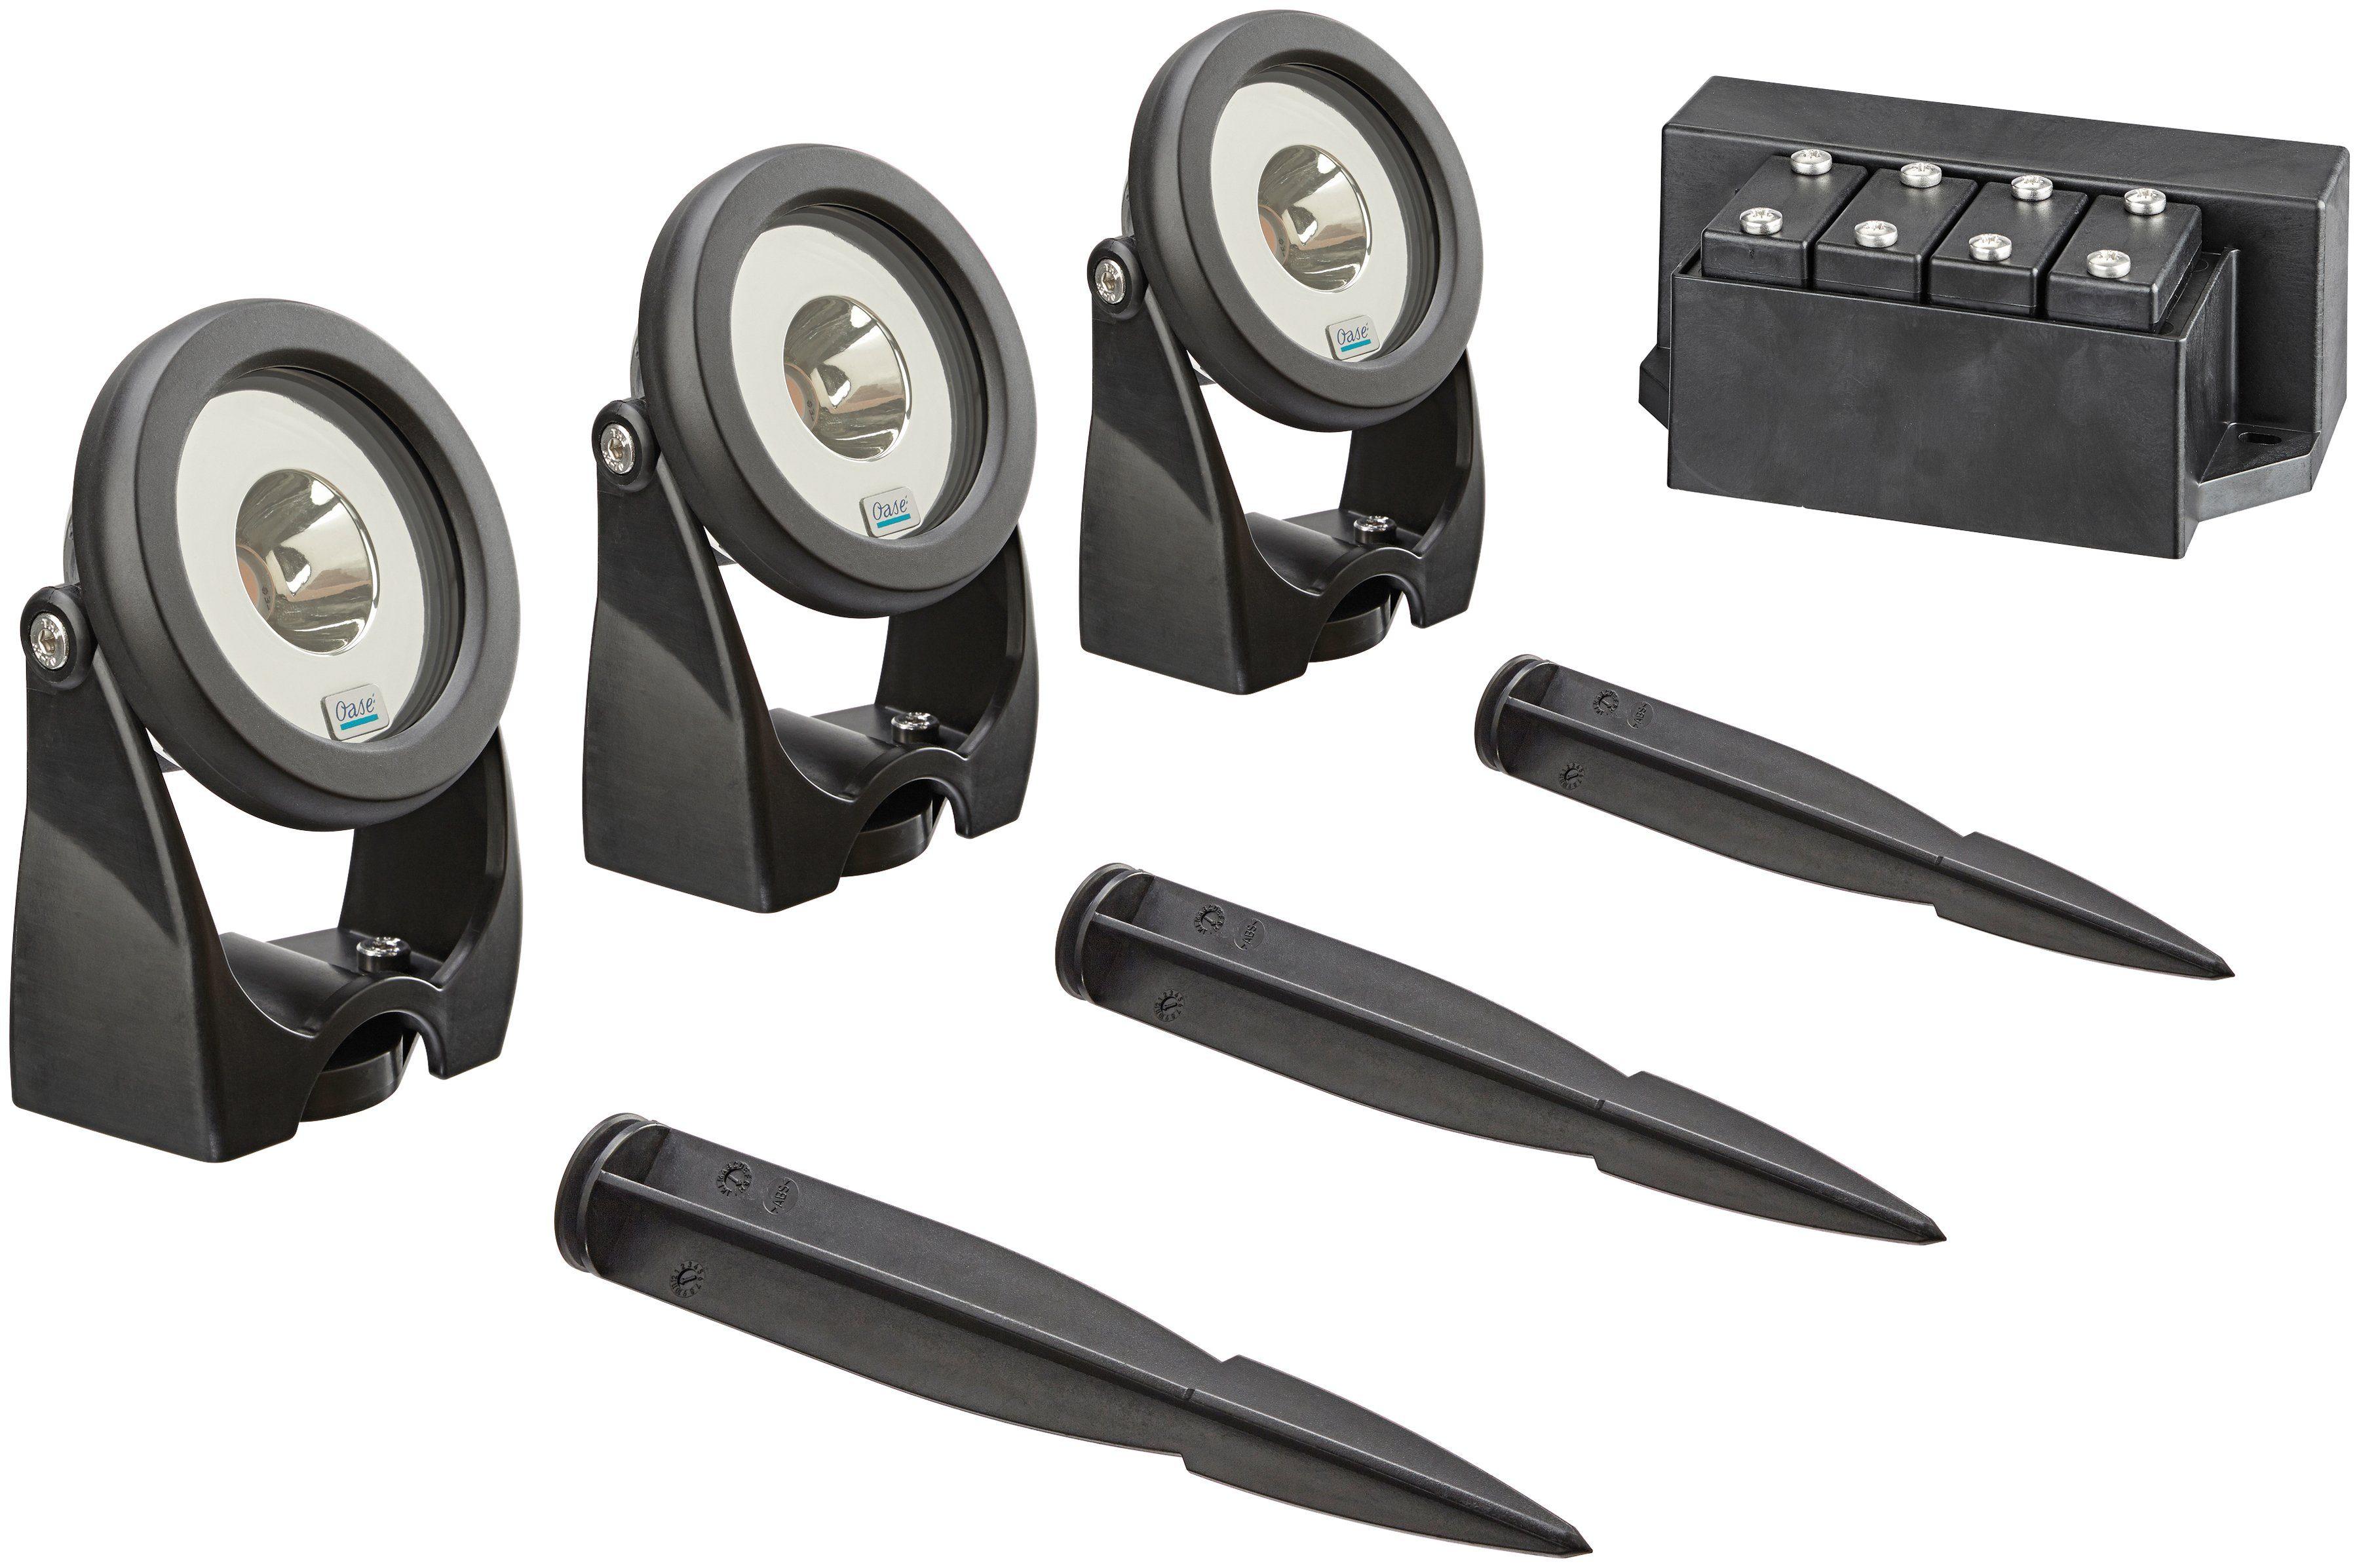 OASE Teichbeleuchtung »LunAqua Power«, LED 3er-Set